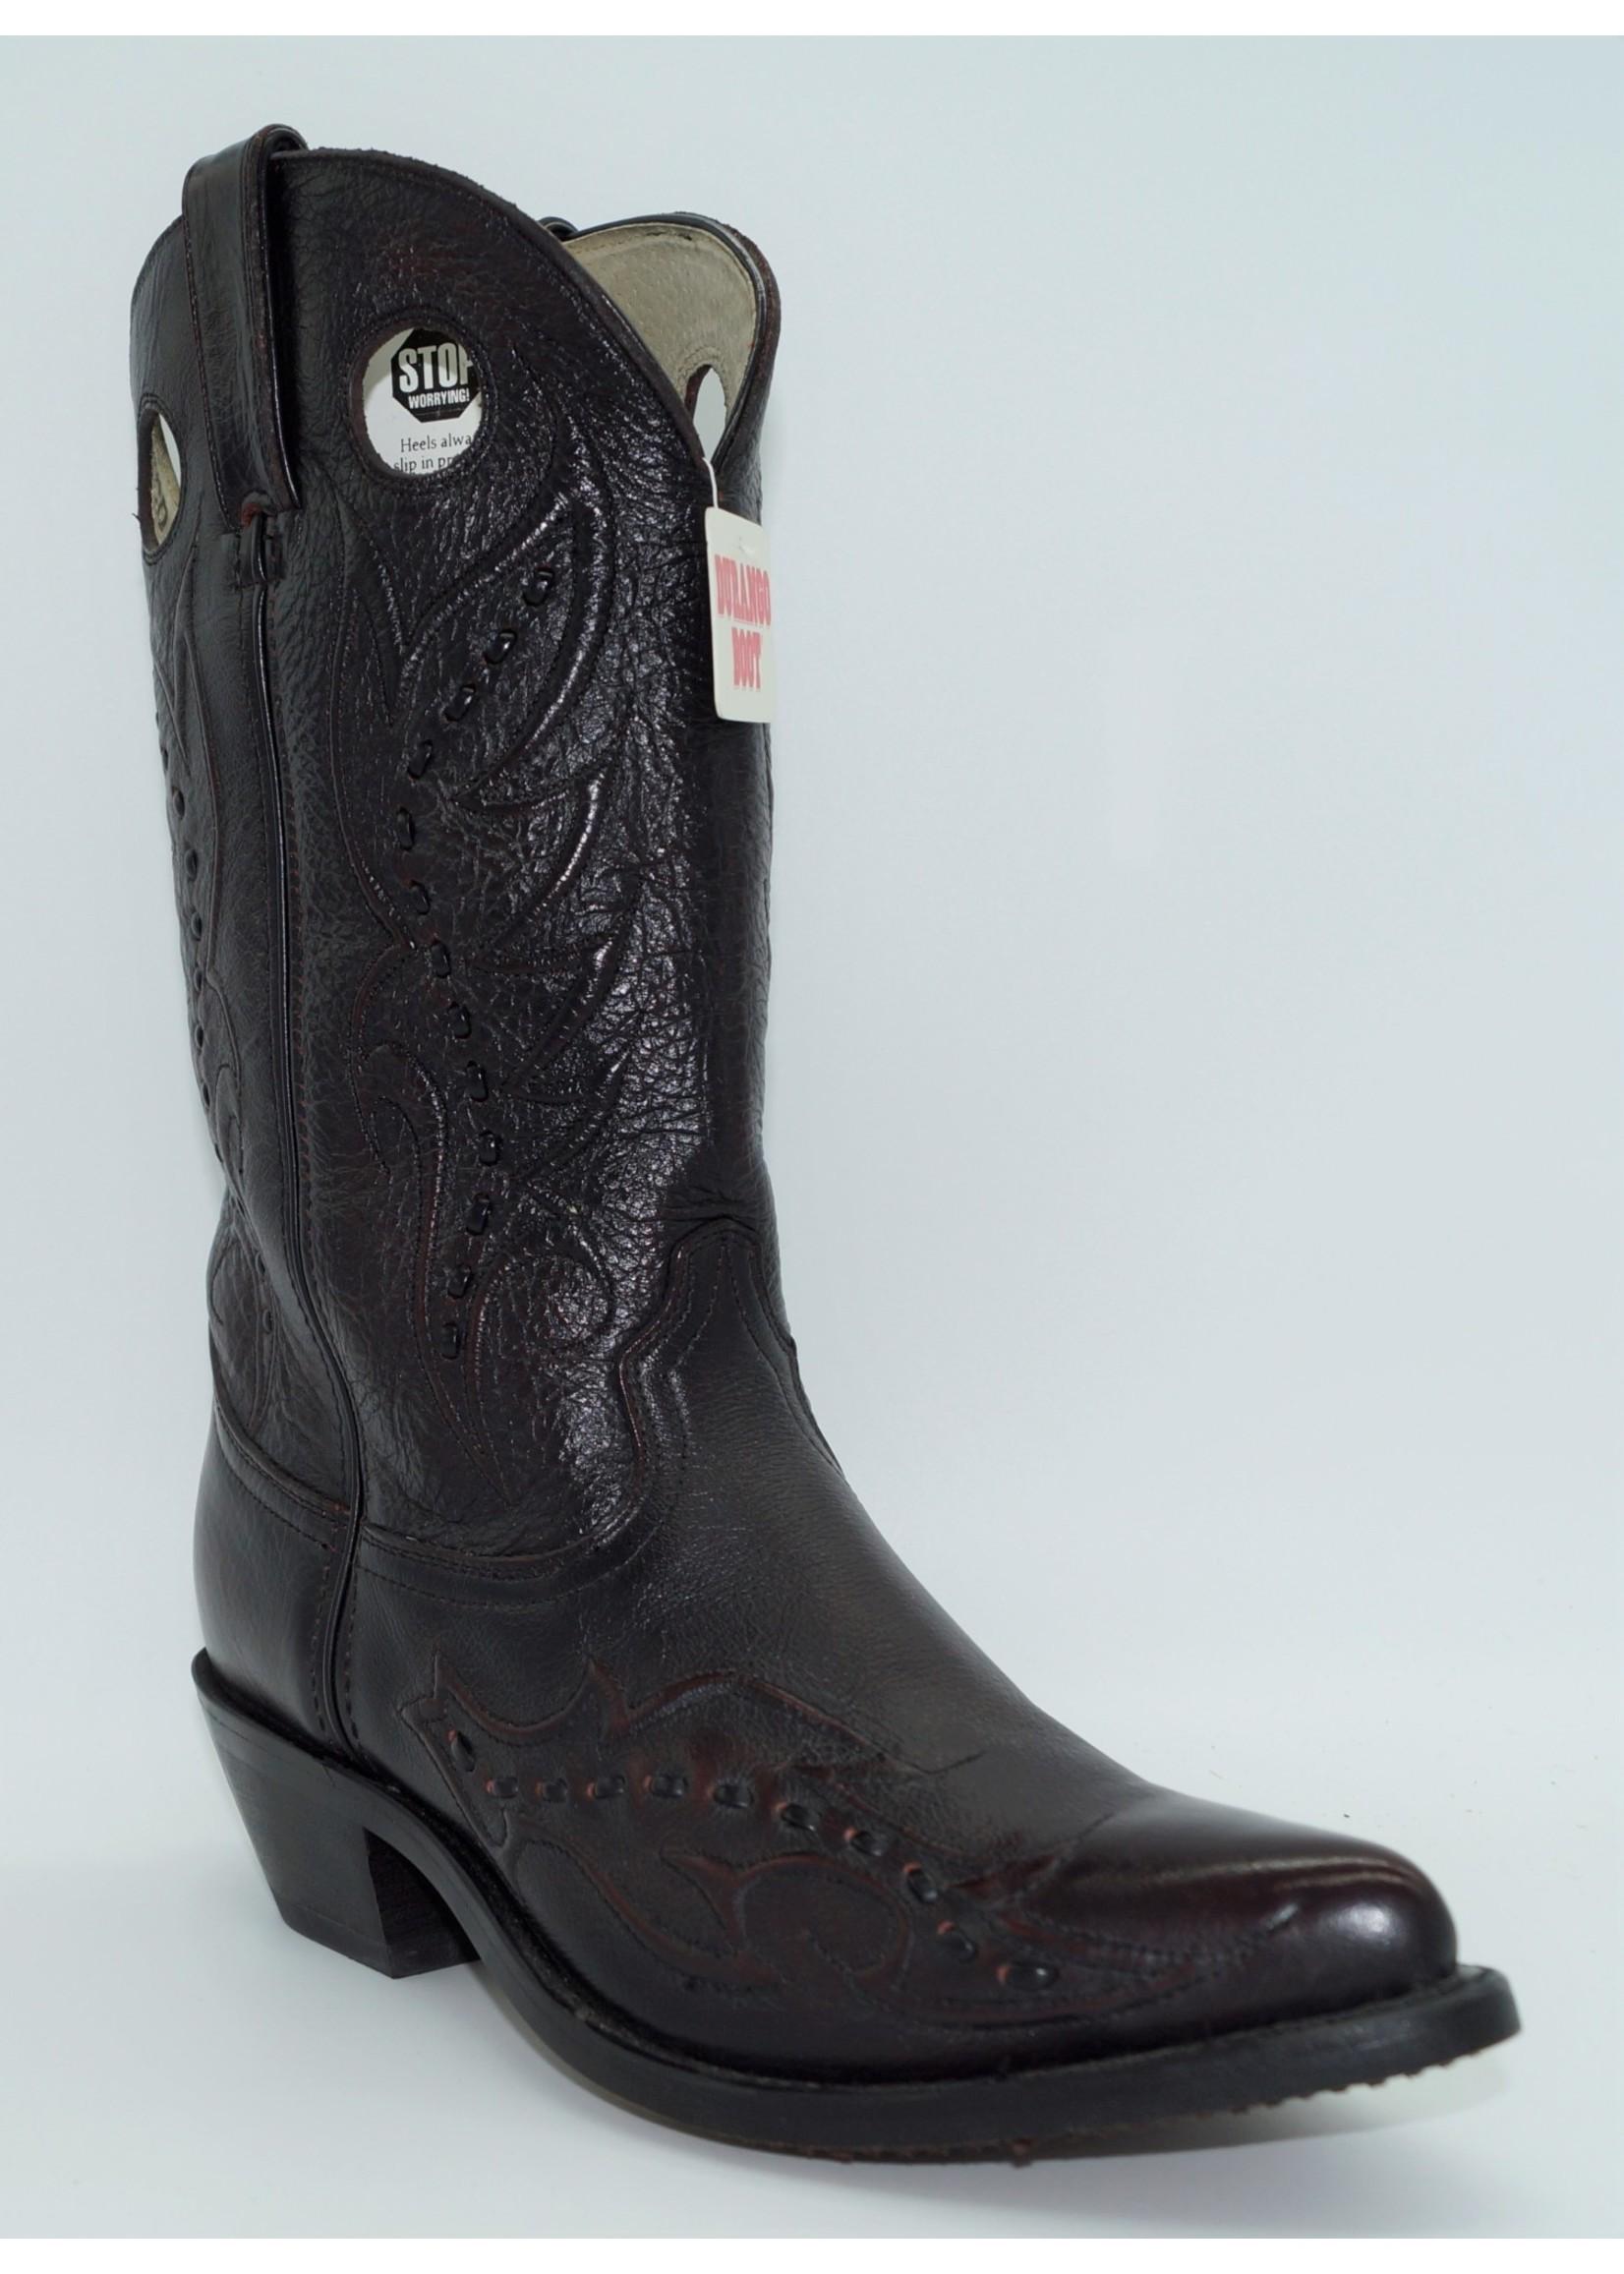 Durango Women's Black Cherry Brush-Off Leather BootRD5335